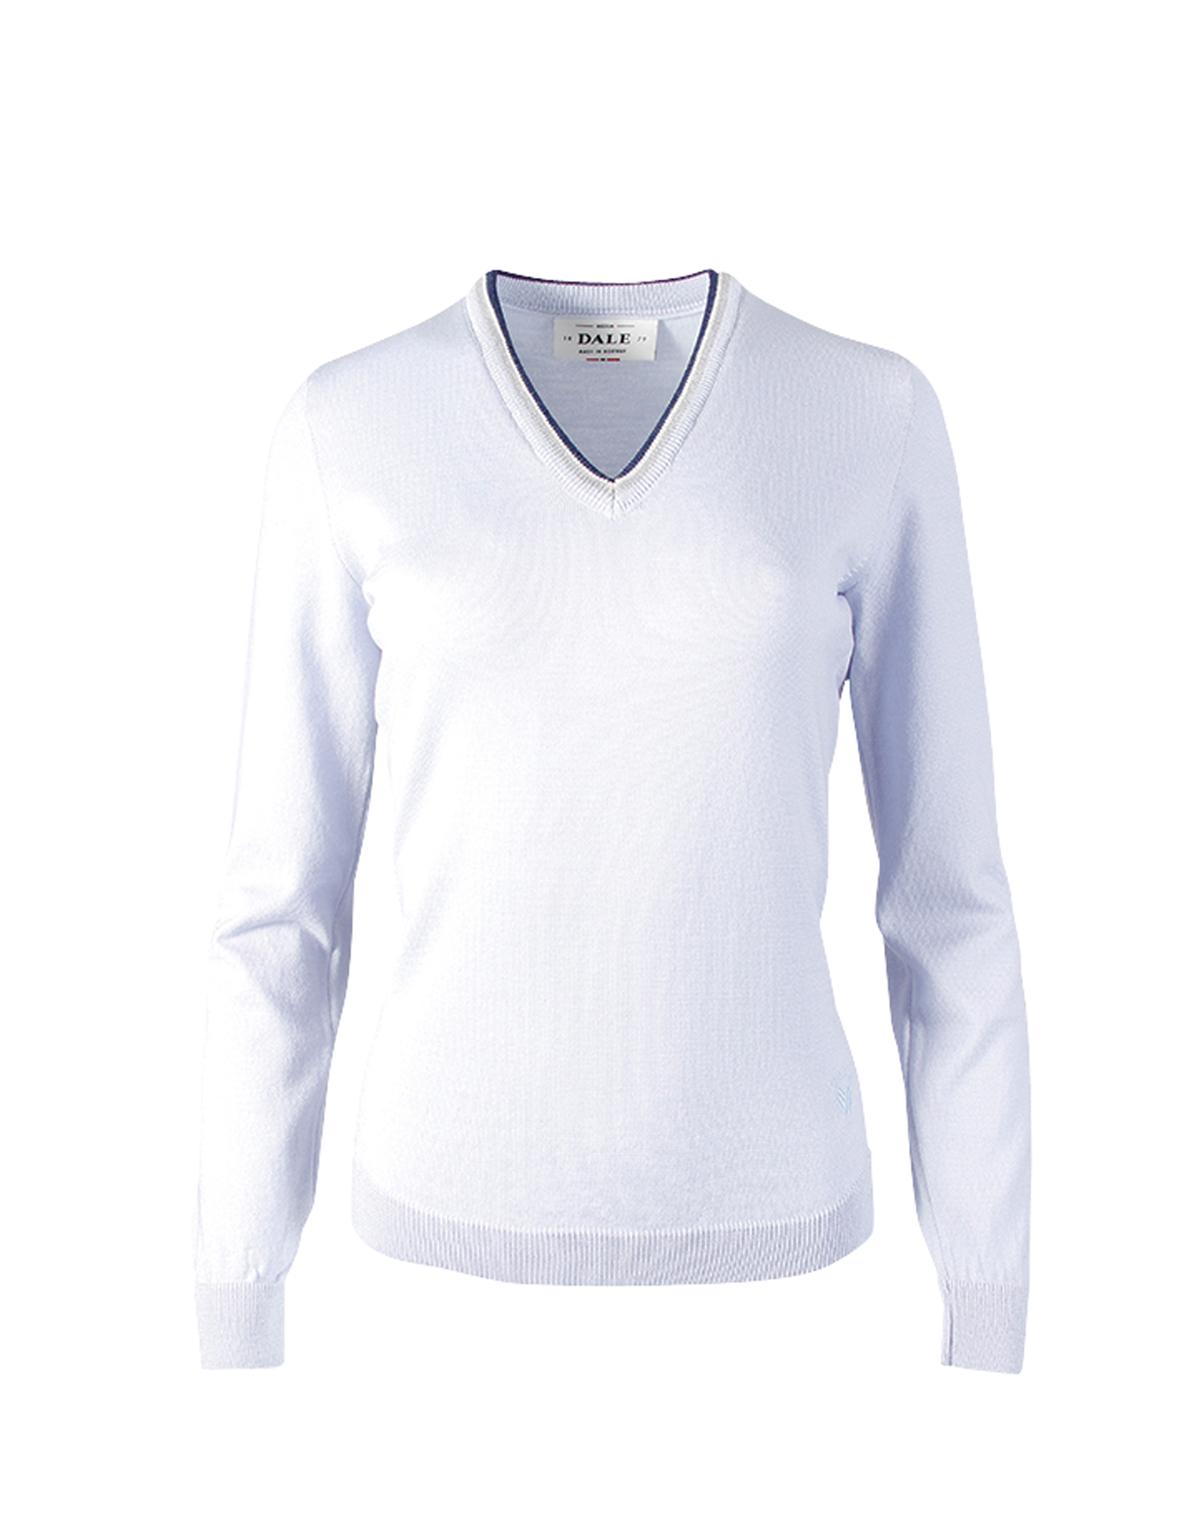 Ice Blue / Off White / Navy / Light Grey (D)